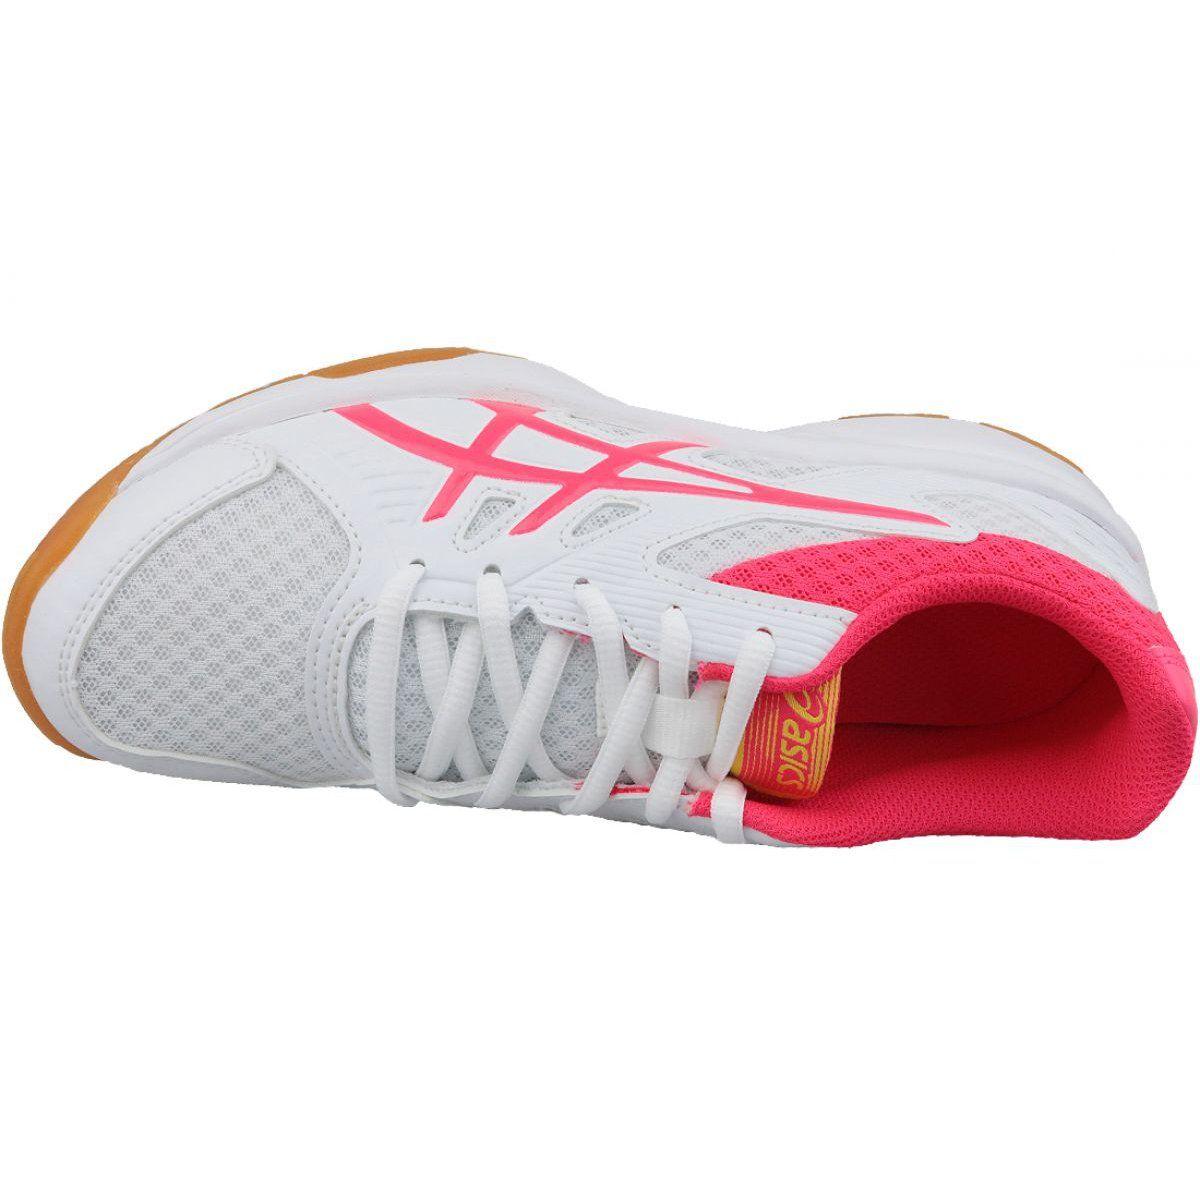 Buty Do Siatkowki Asics Upcourt 3 W 1072a012 104 Biale Wielokolorowe Volleyball Shoes Most Popular Shoes Popular Shoes